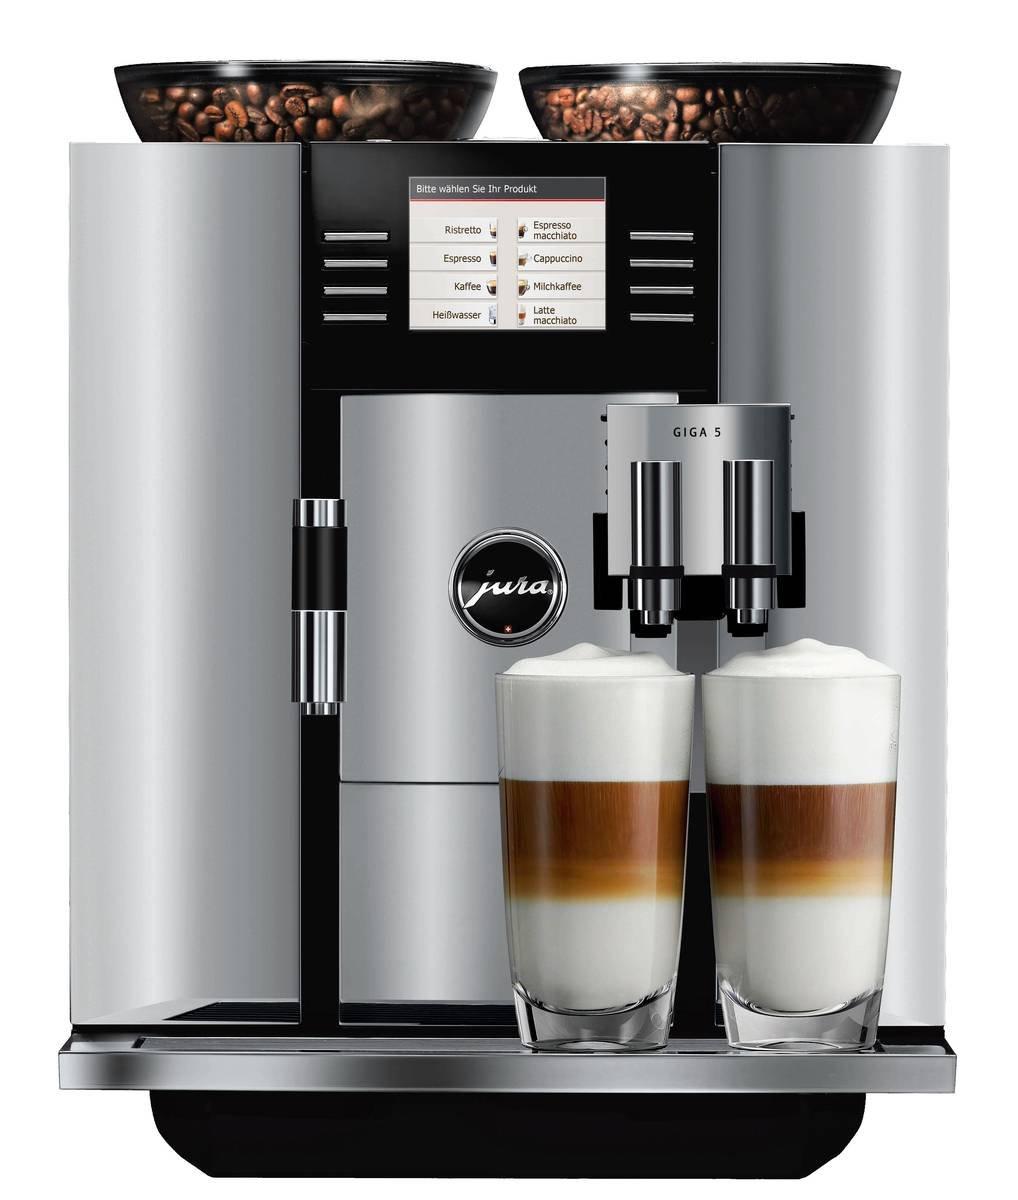 Jura Coffee Maker Manual